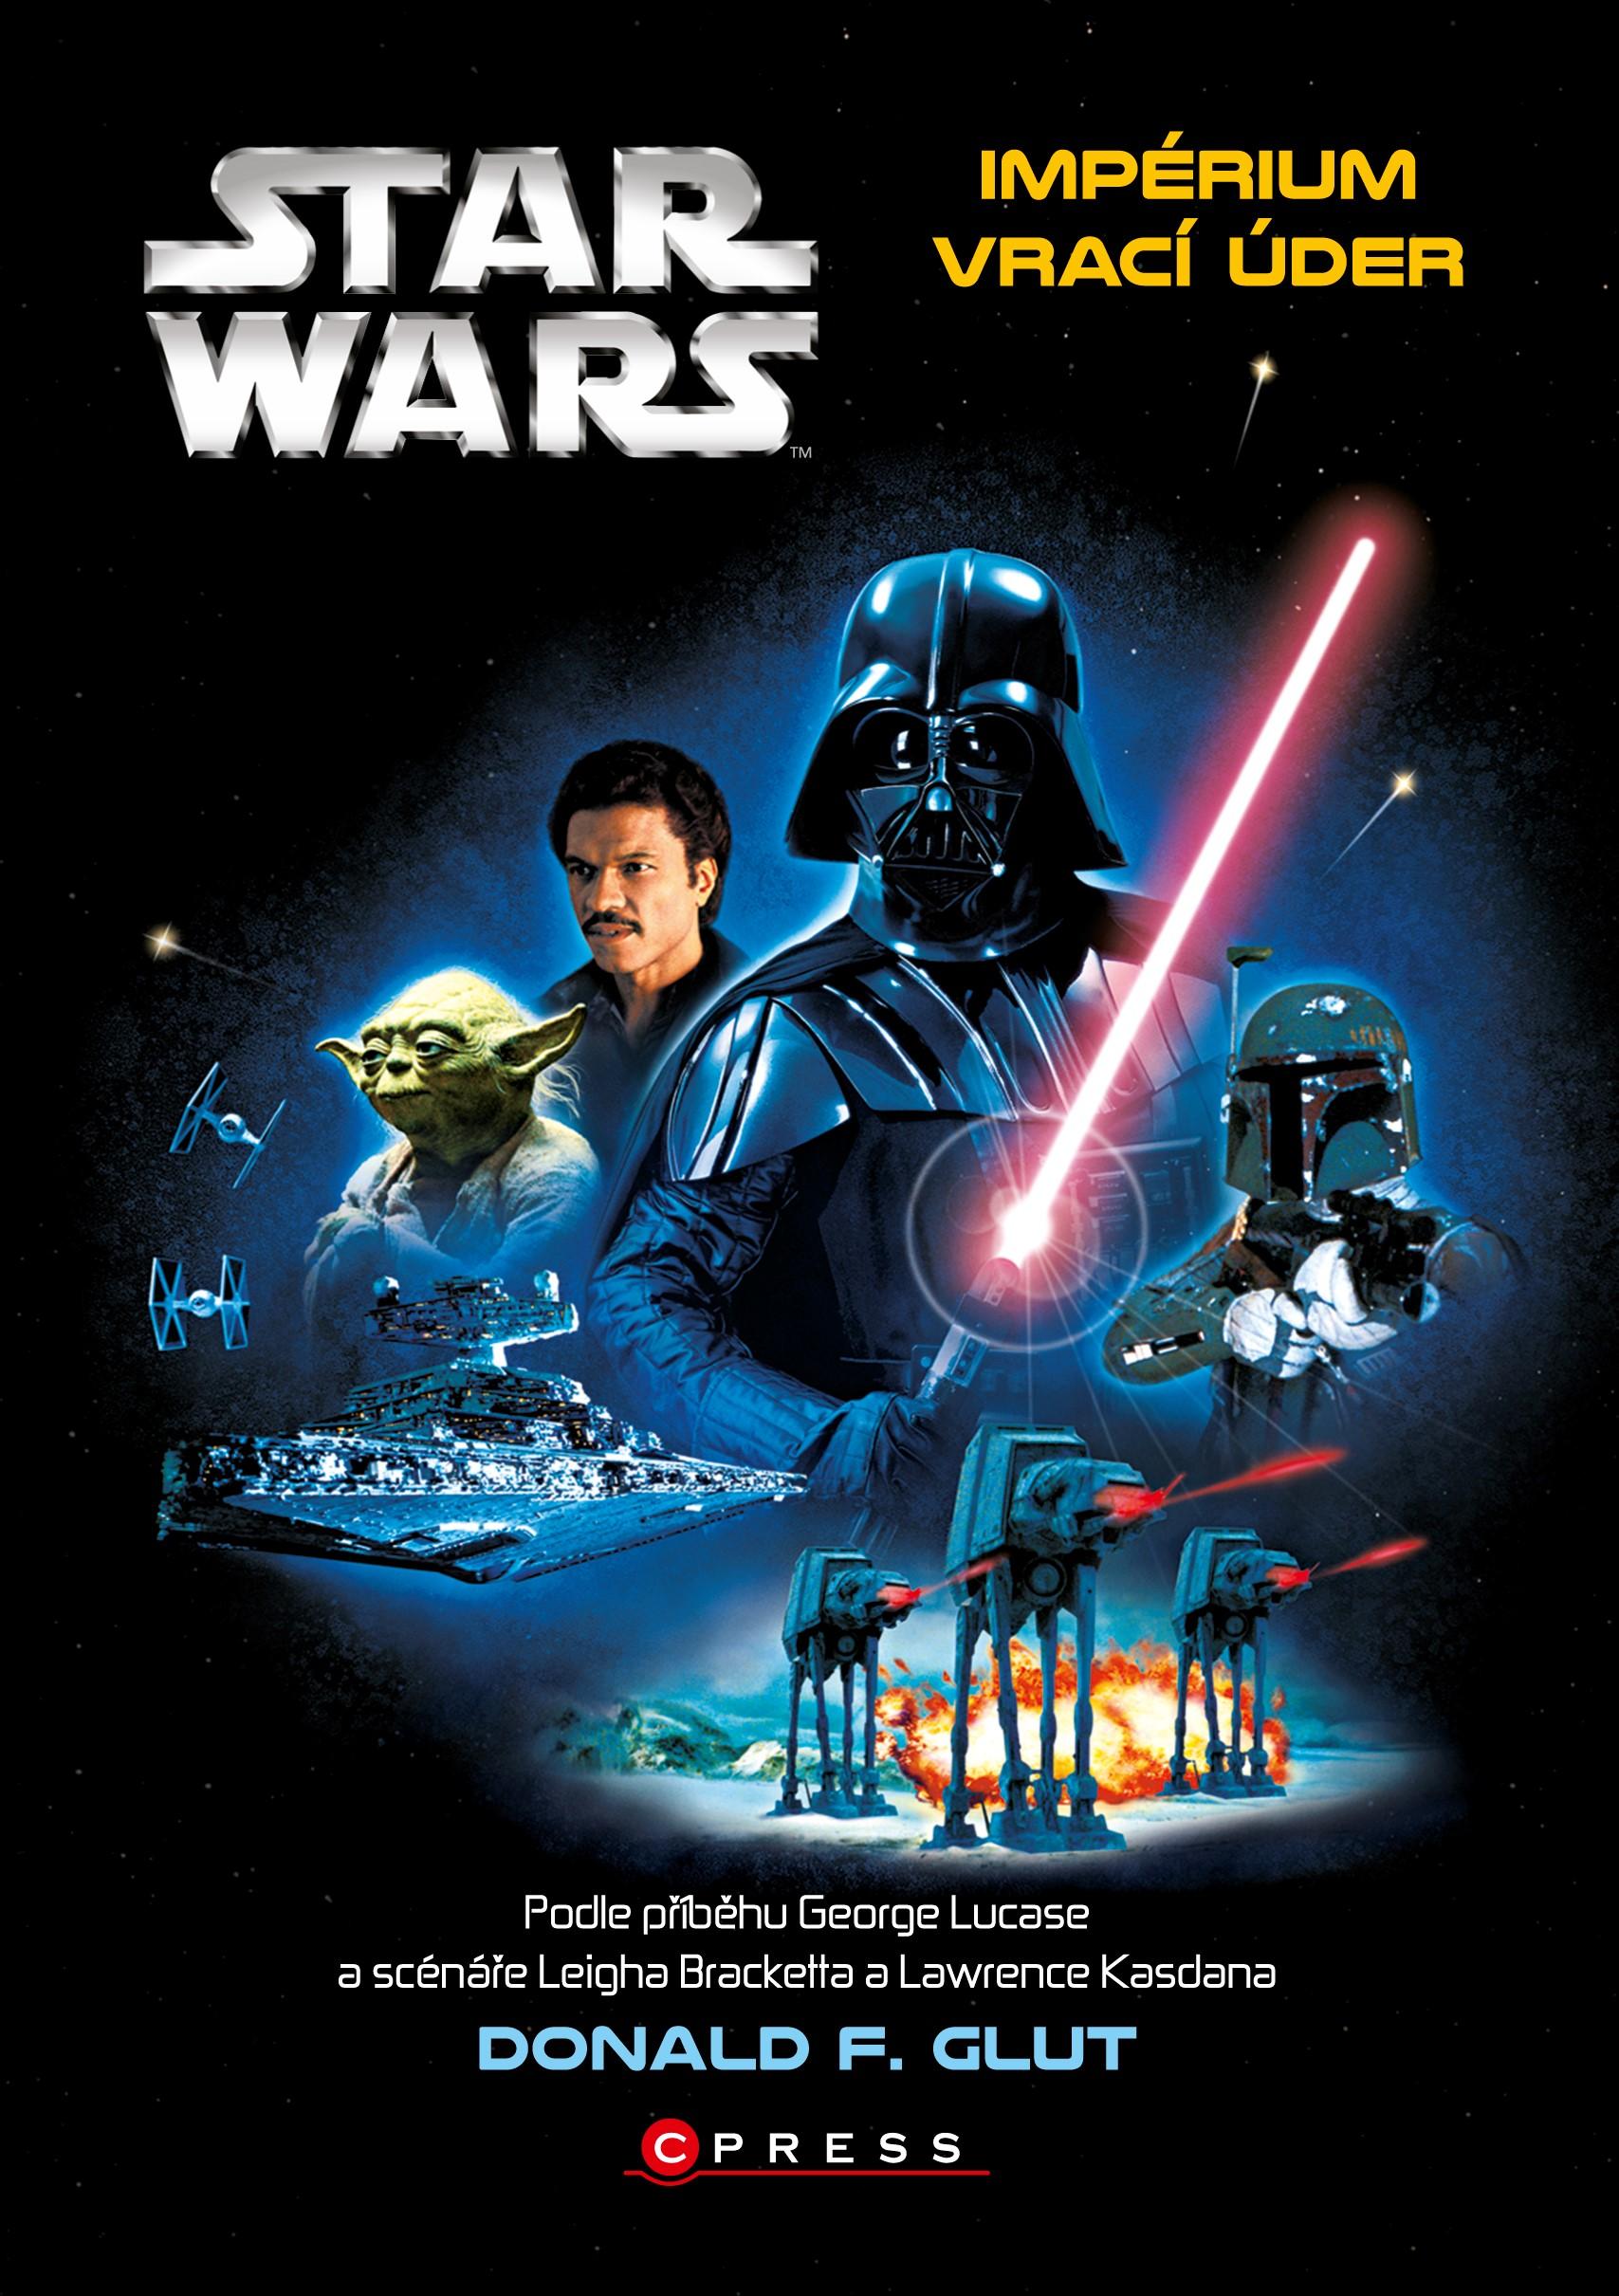 Star Wars: Impérium vrací úder | George Lucas, Donald F. Glut